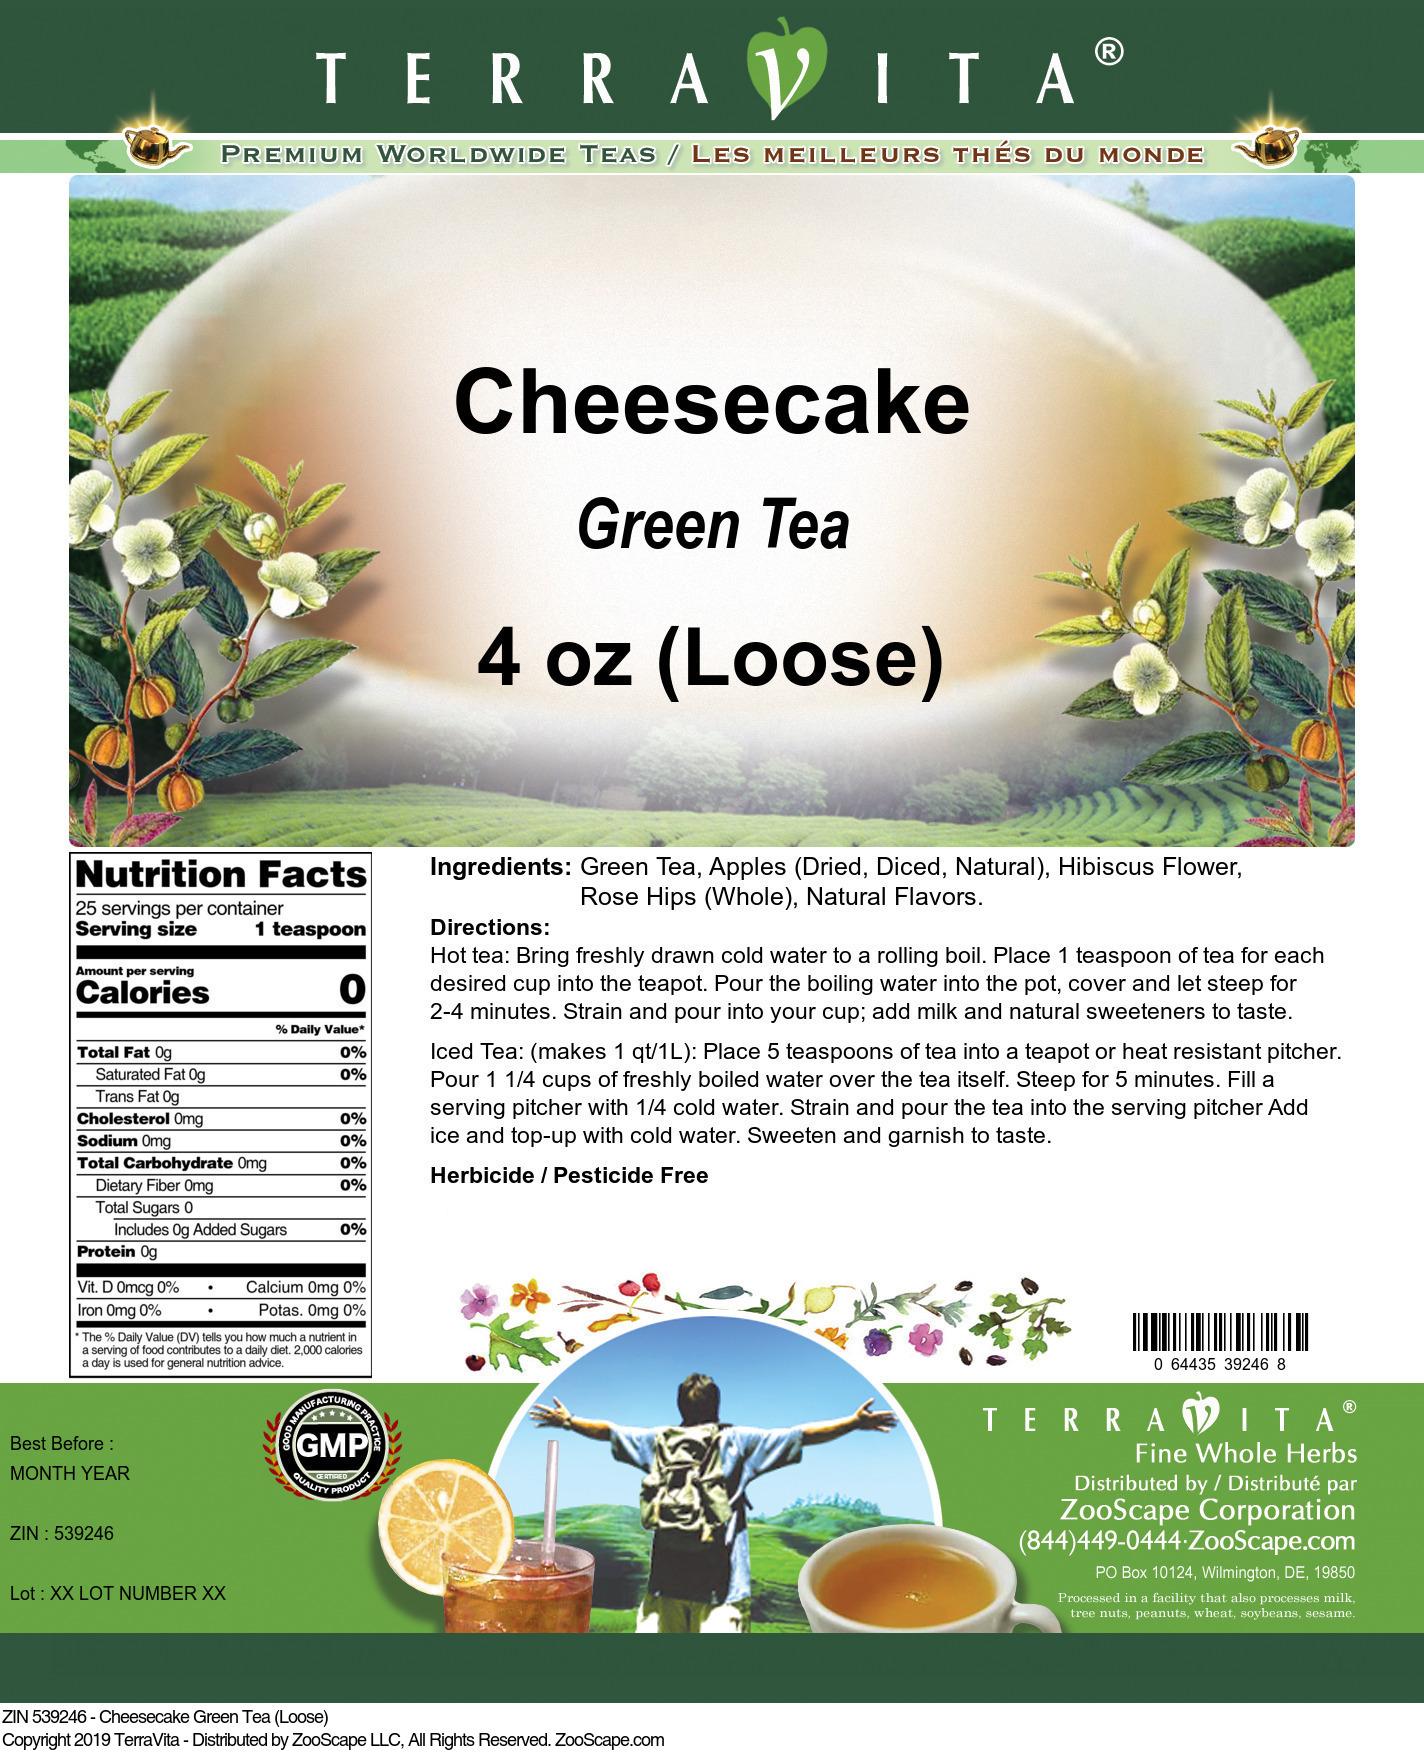 Cheesecake Green Tea (Loose)